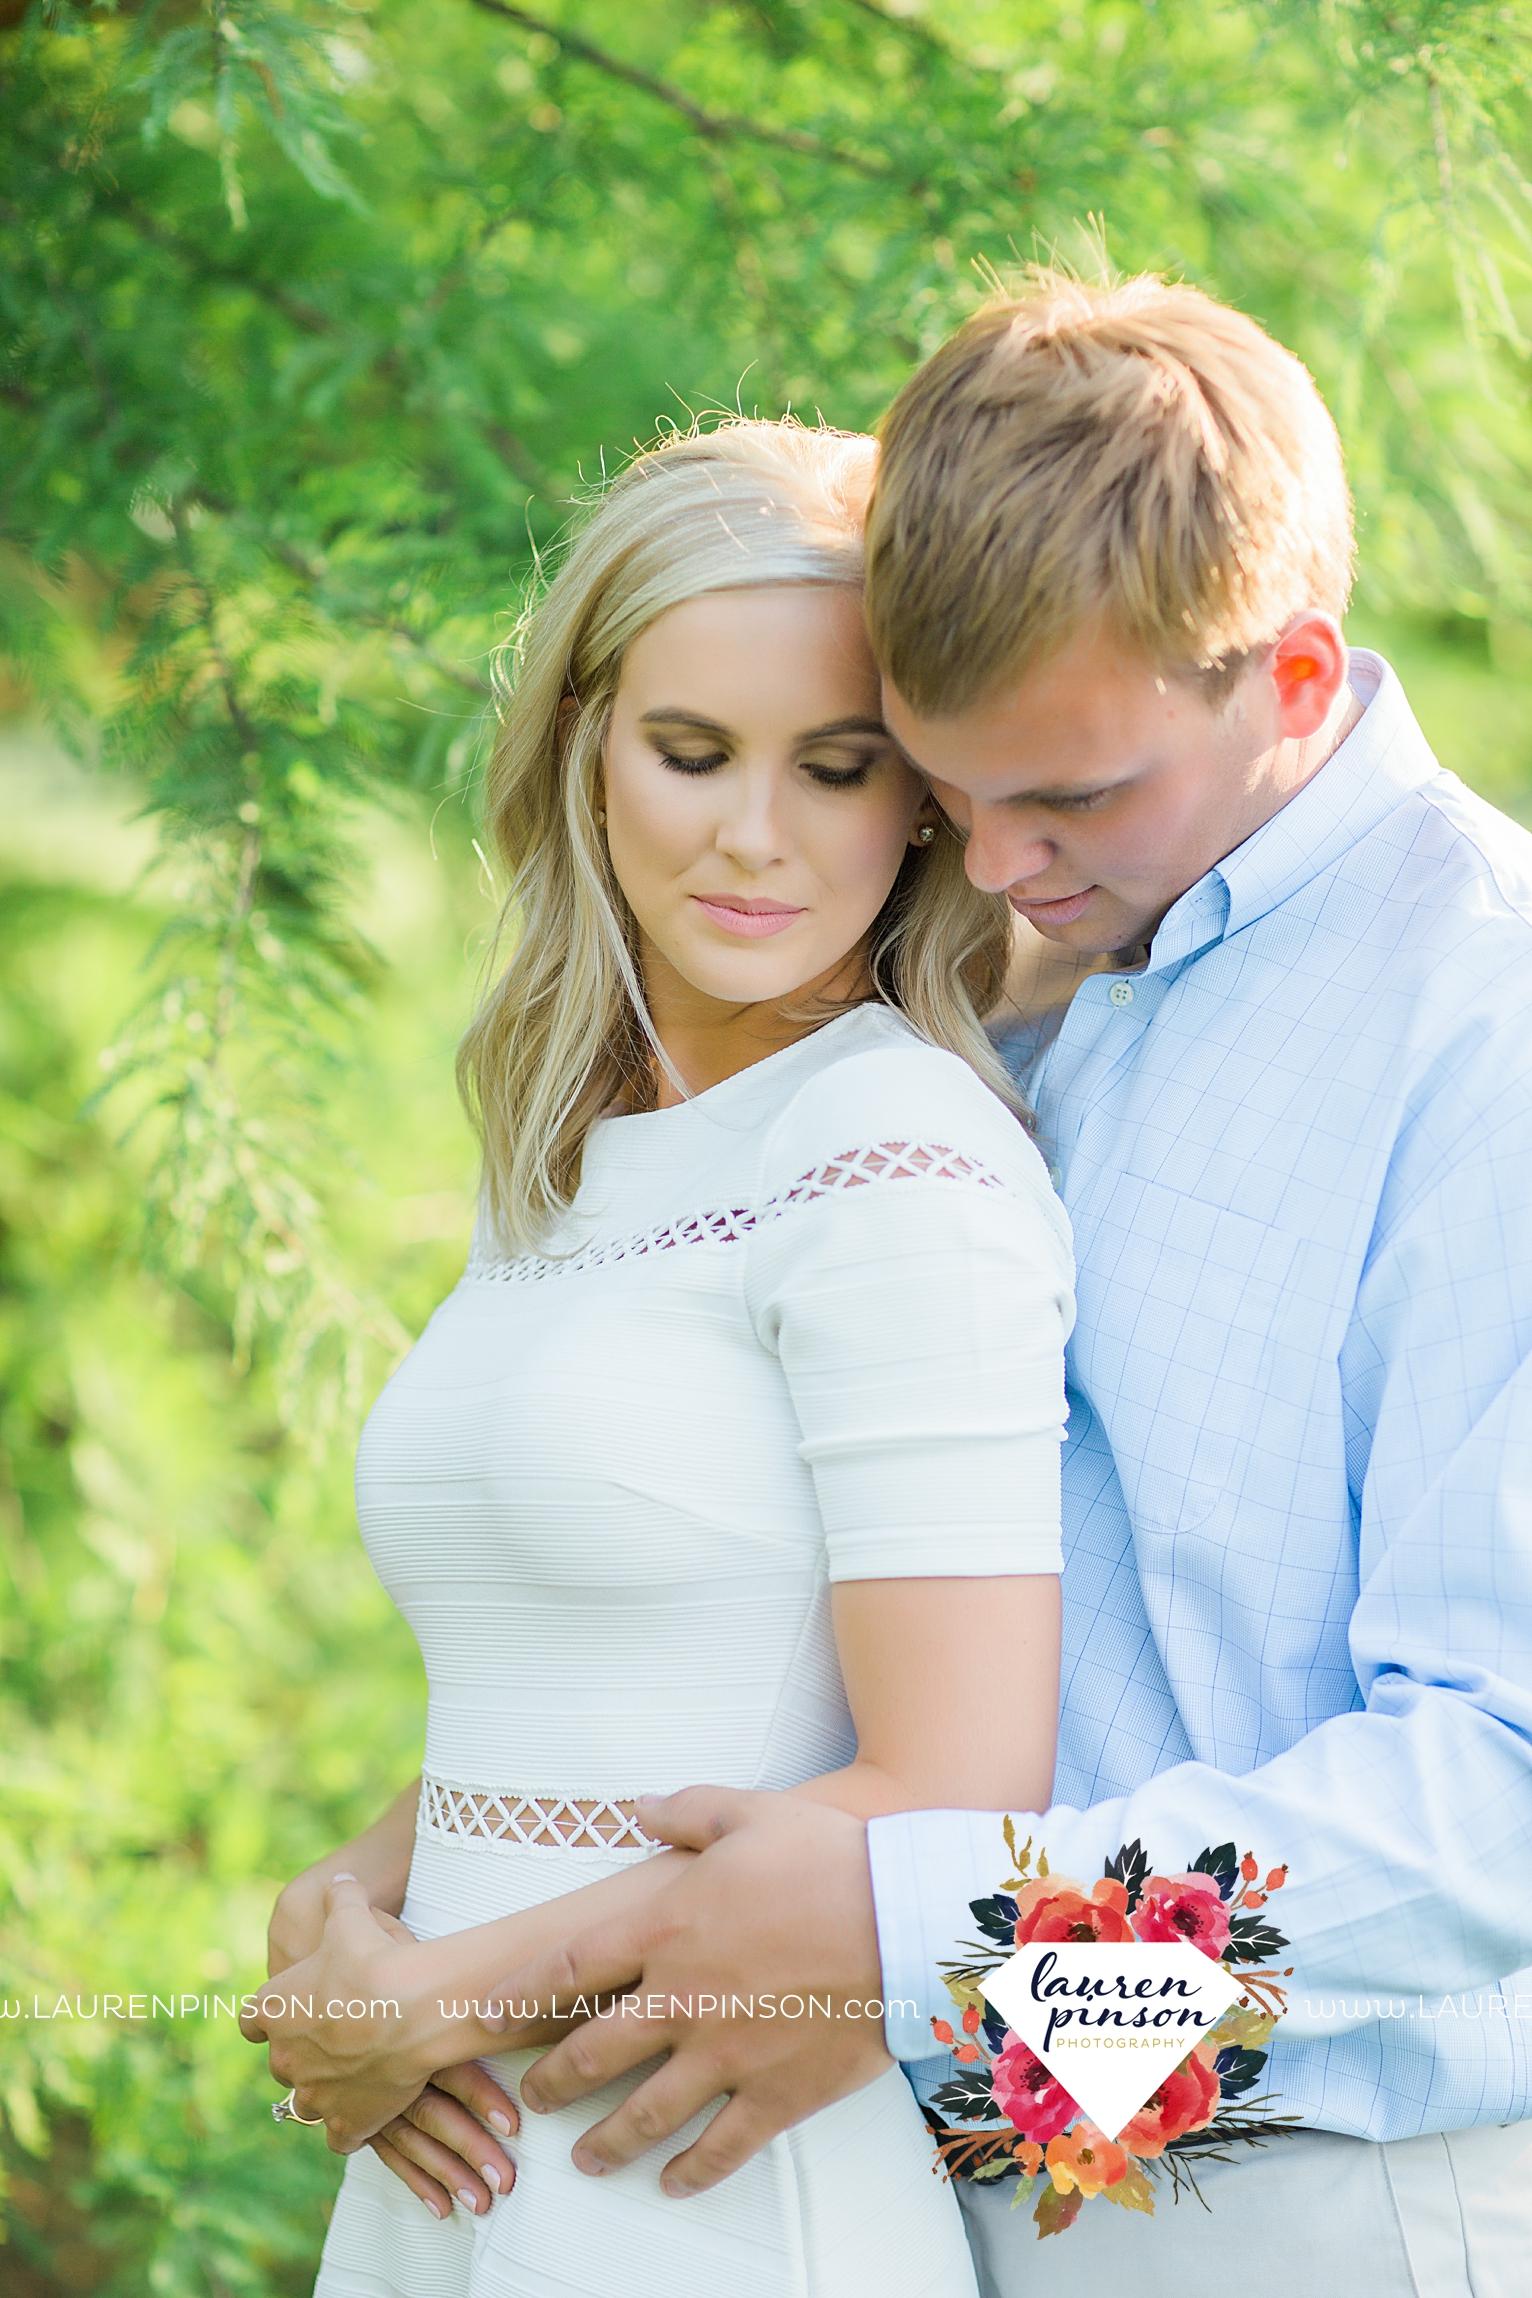 wichita-falls-texas-wedding-photographer-beachy-engagement-session-at-lake-wichita_2909.jpg